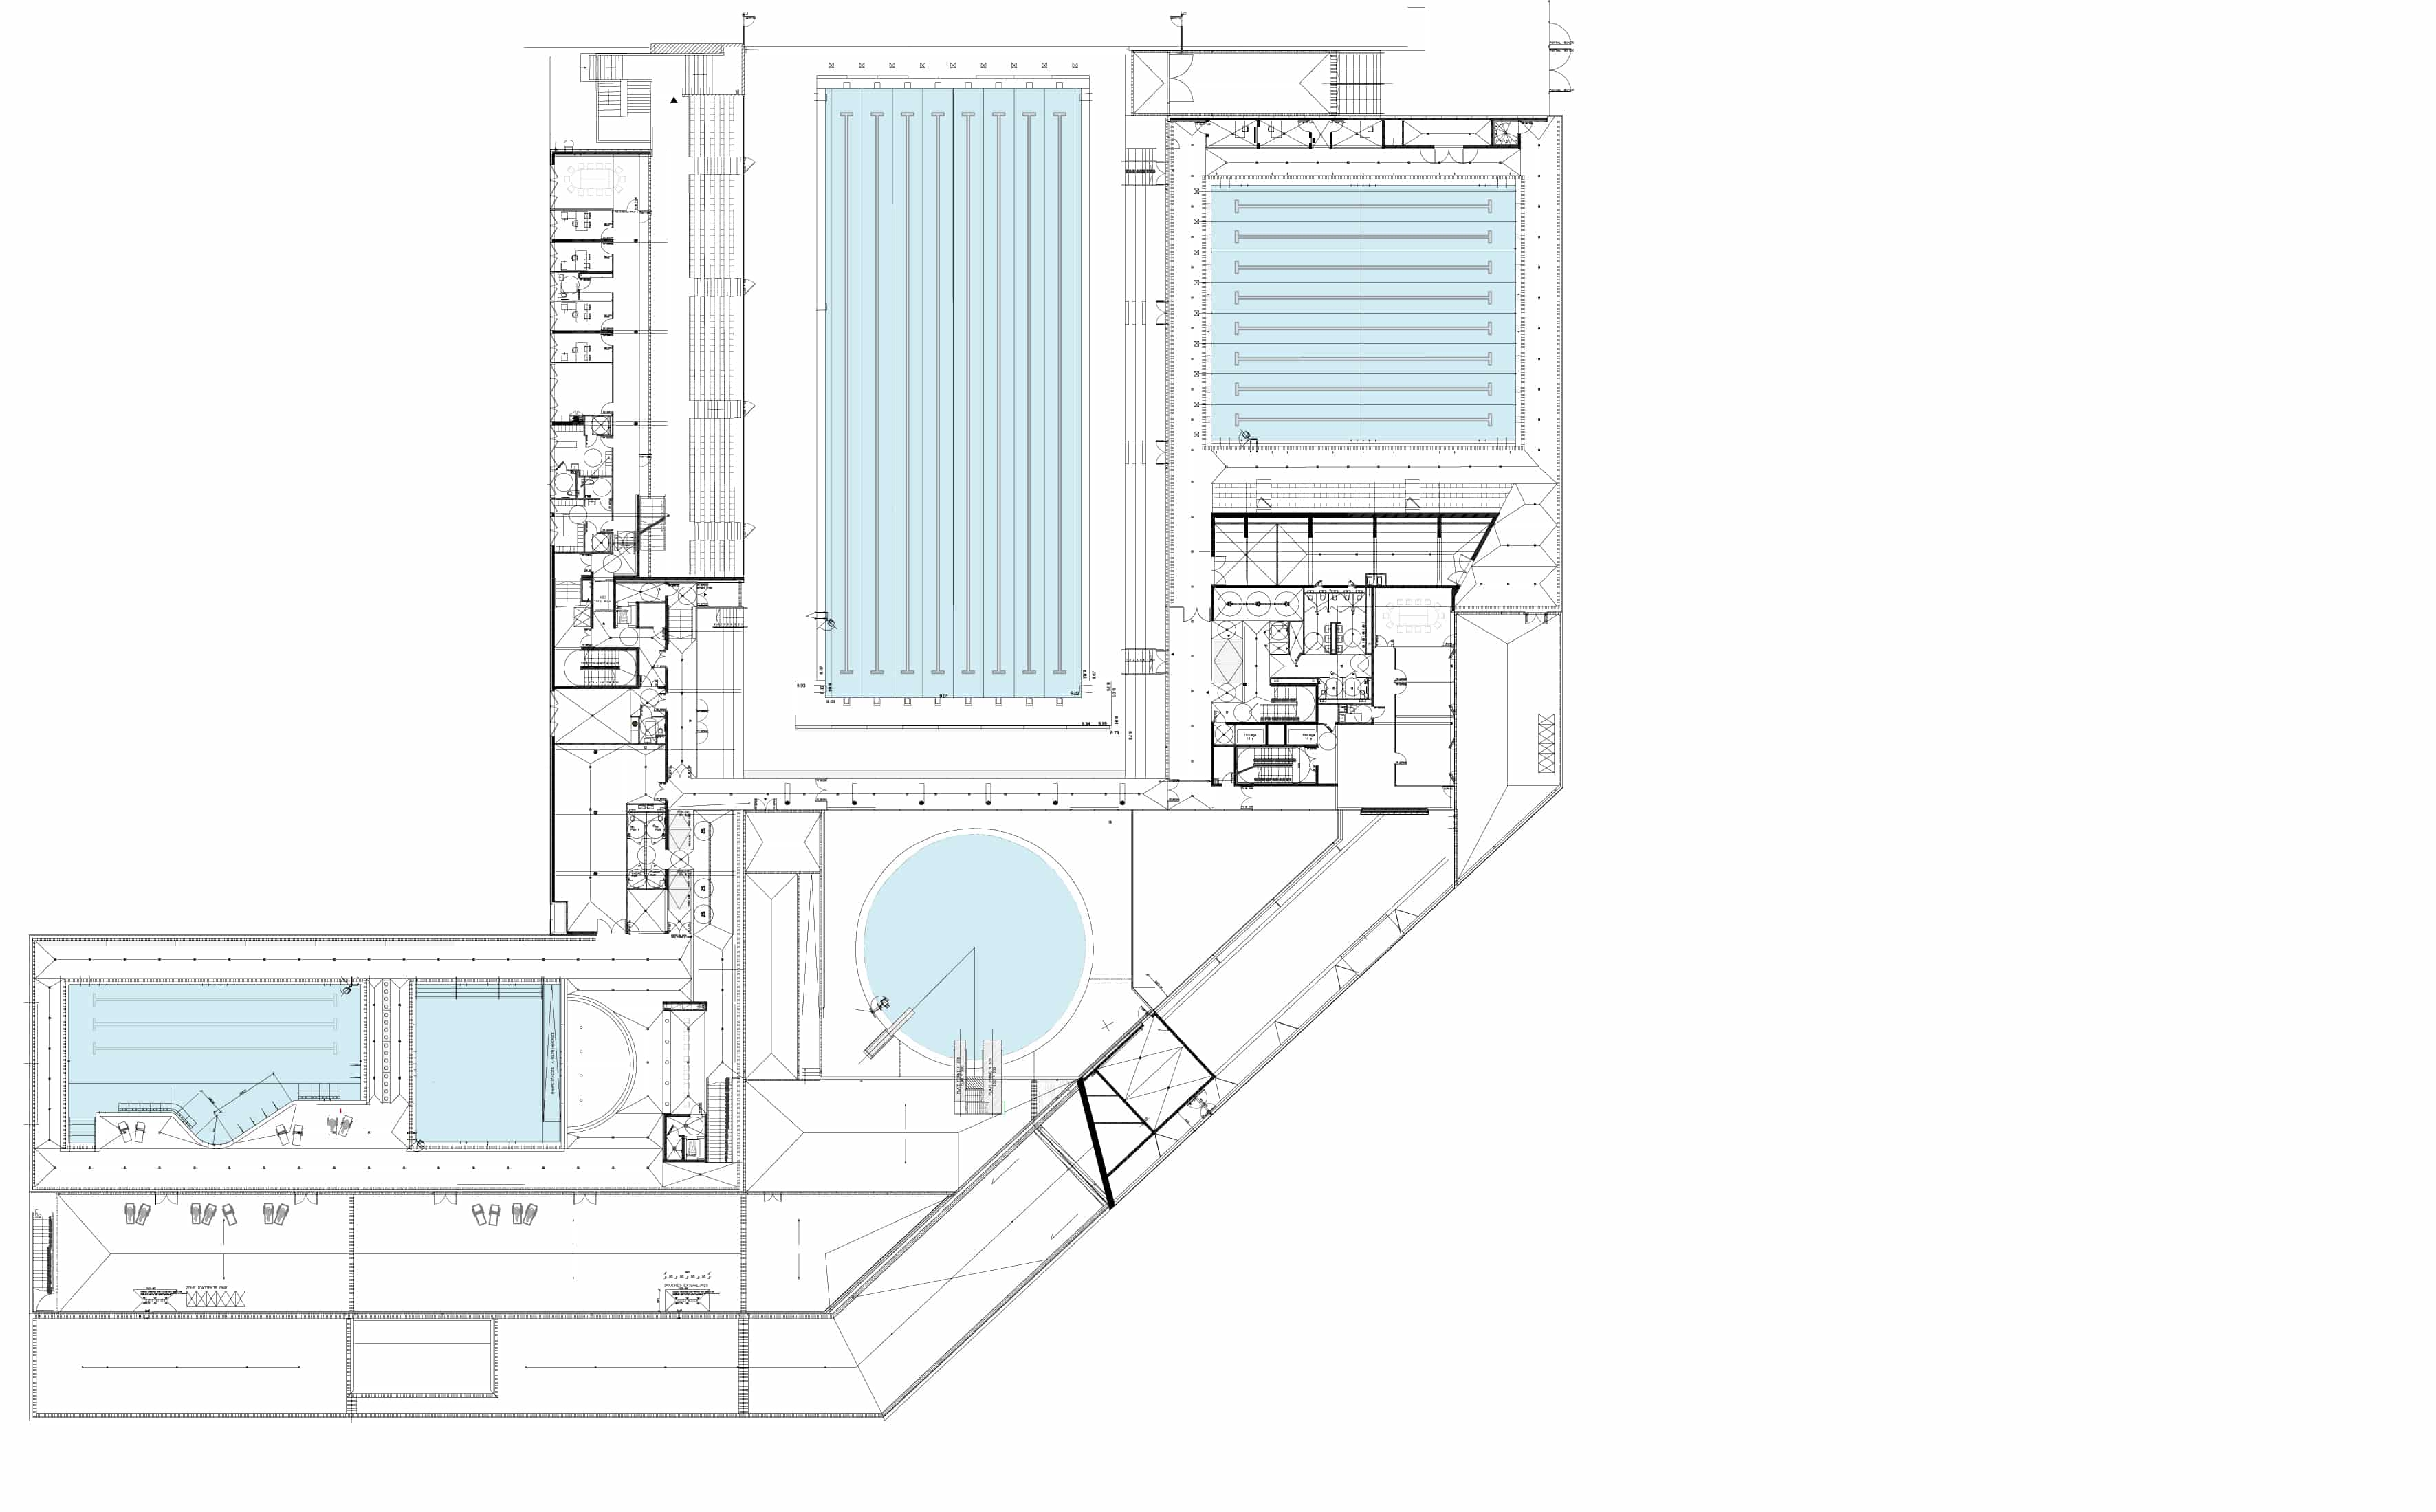 plan 2 - Stade nautique - Caen